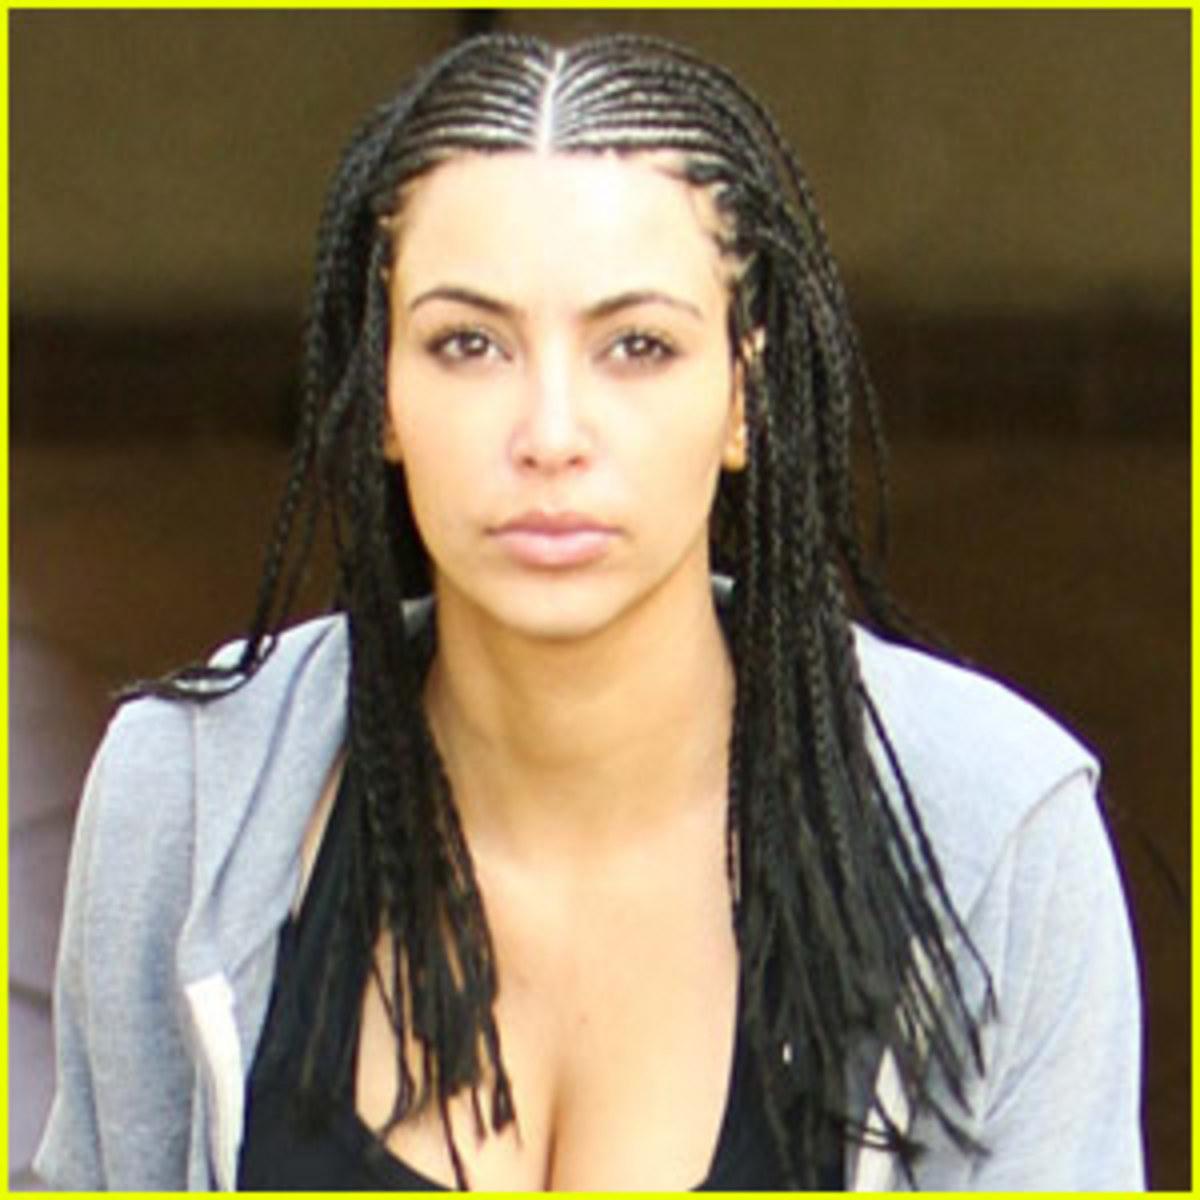 Kim Kardashian Hairstyles: Wigs, Waves, Curls, and Braids